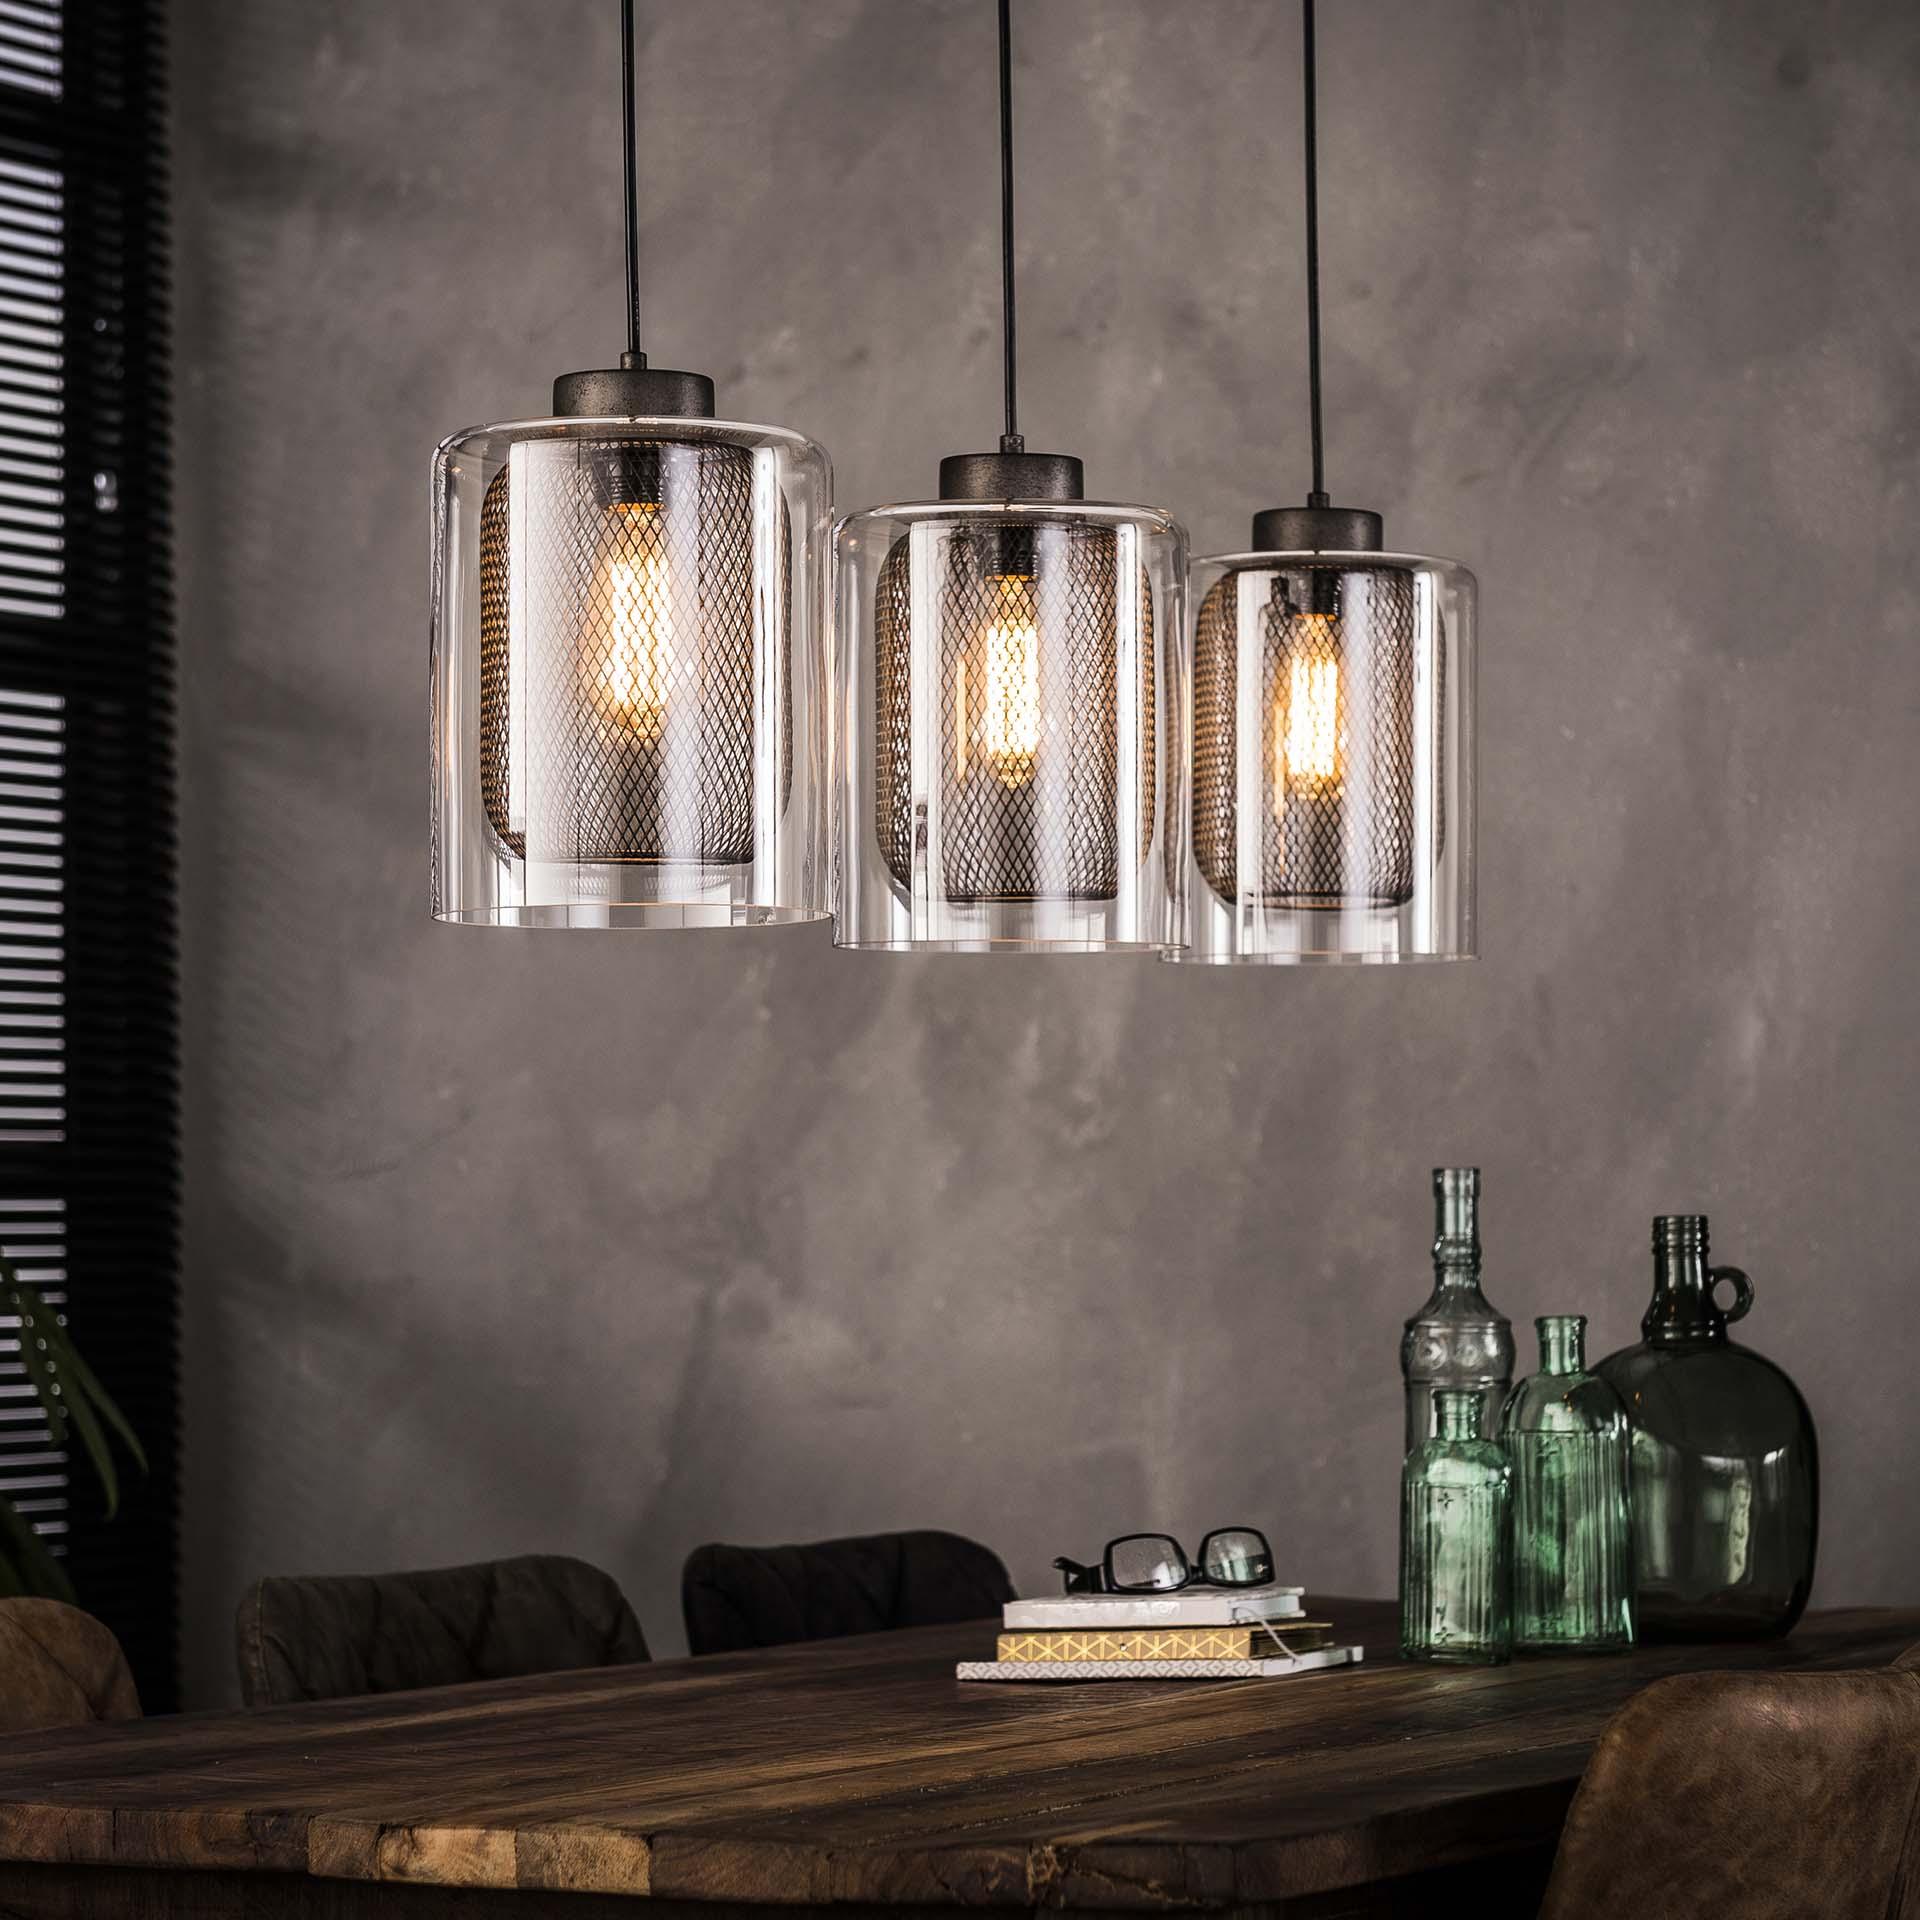 Hanglamp 3x20 raster glas Oud zilver